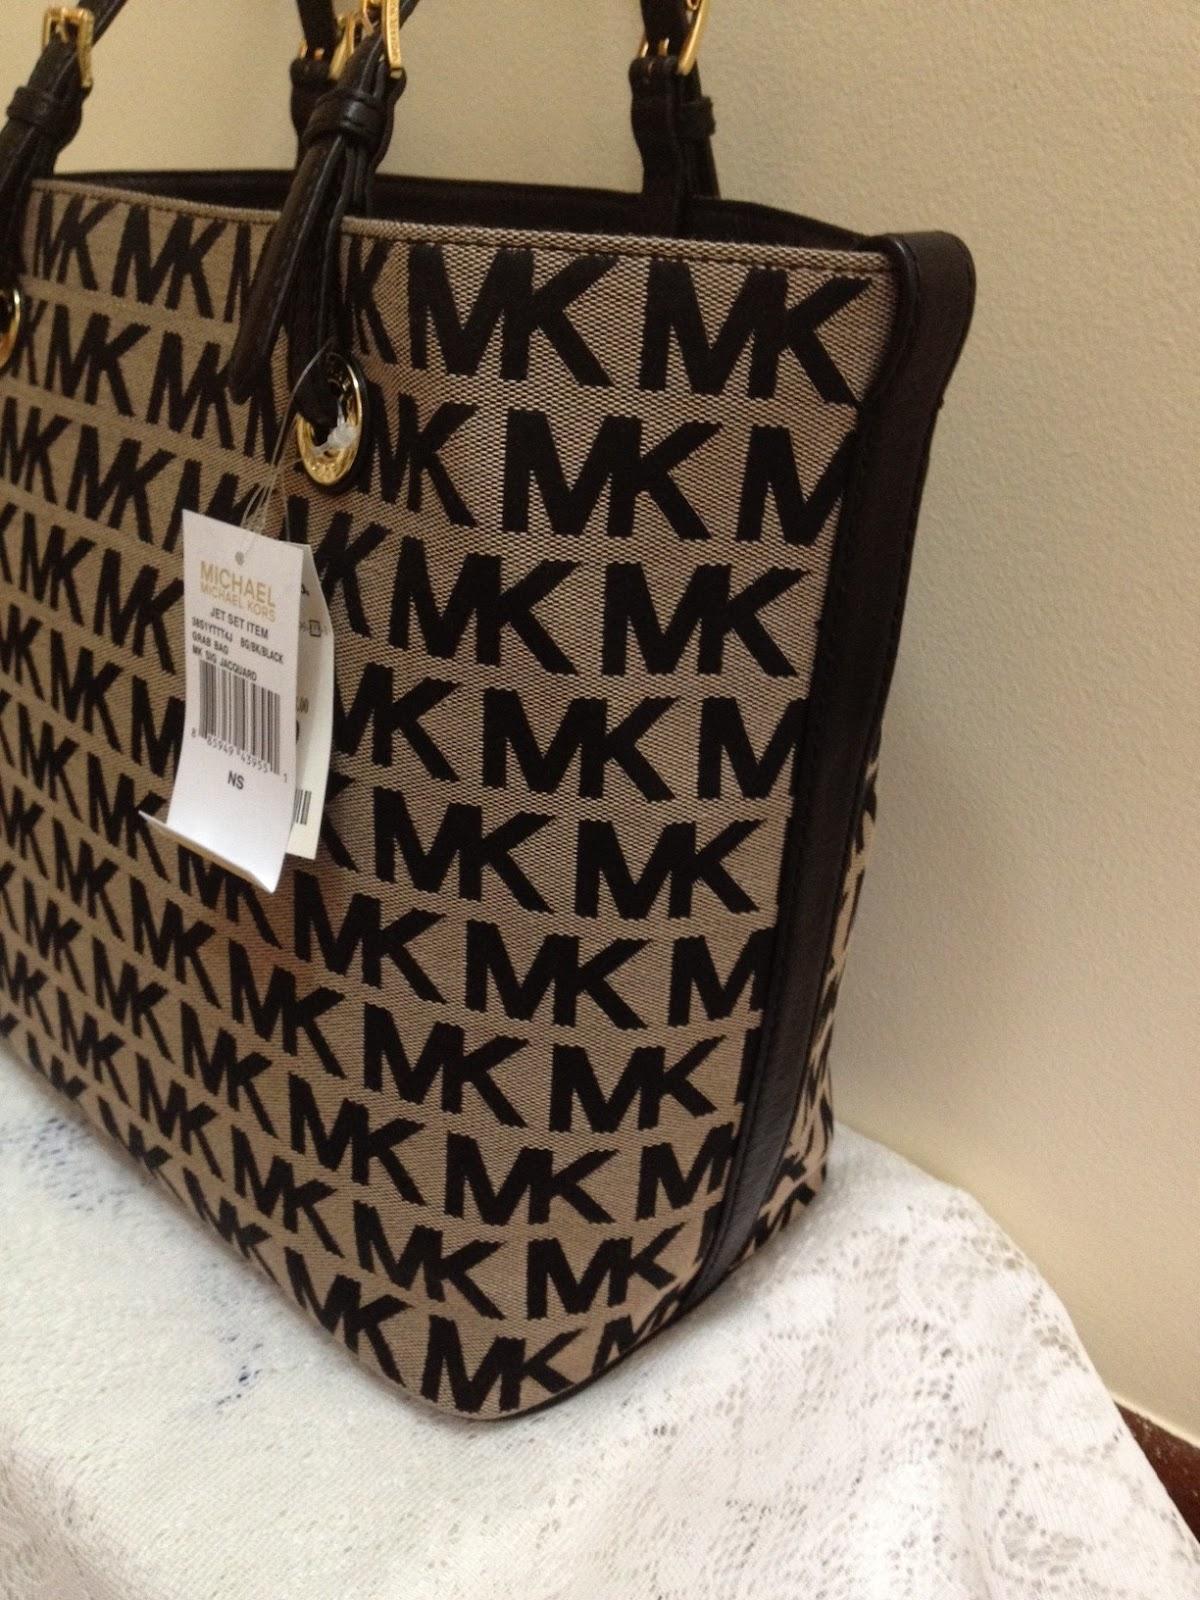 Jacquard Fabric Trim Leather Michael Kors Bag Double Handles With 8 Drop Mk Logo Circle Charm 2 Open Side Pockets